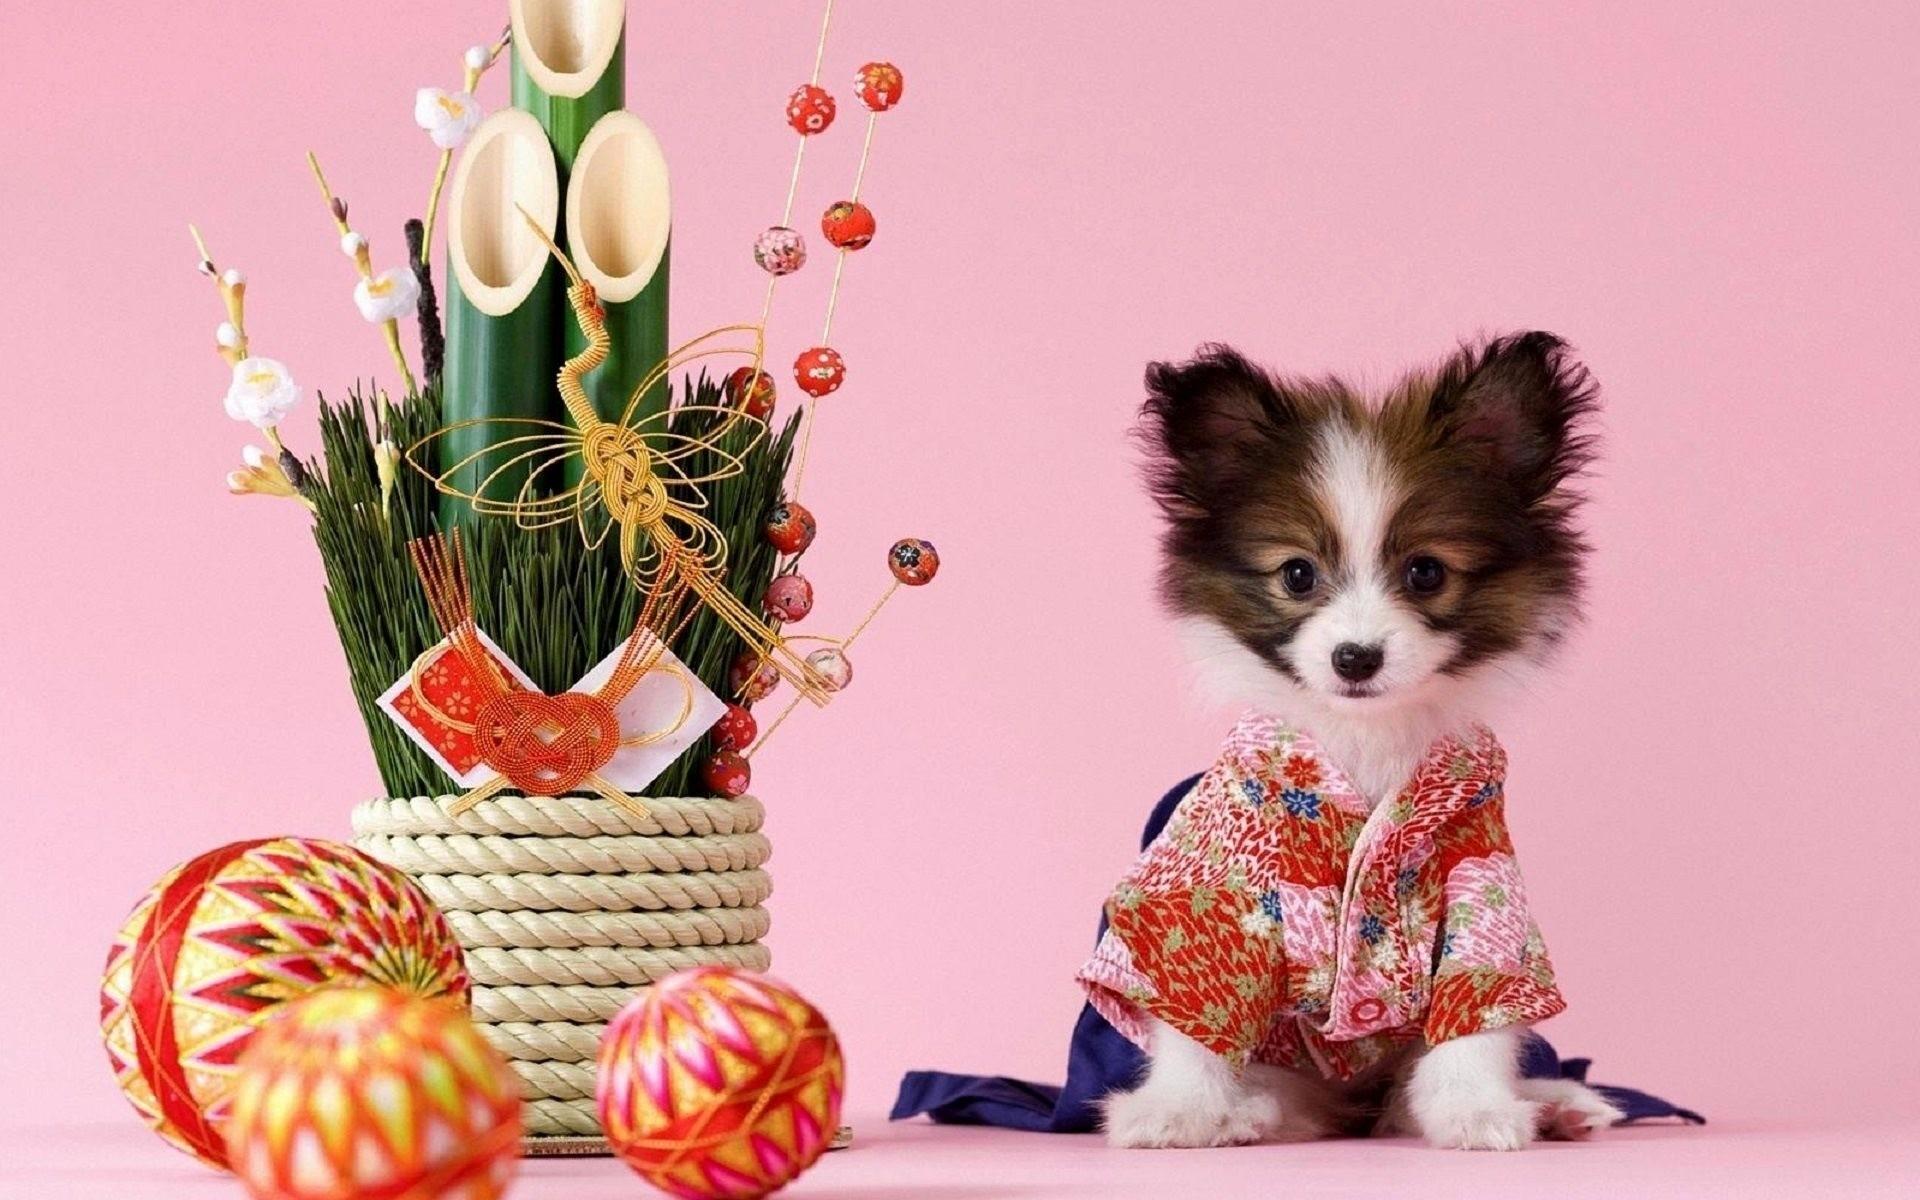 Res: 1920x1200, kimono, dog, ikebana, bamboo, sakura